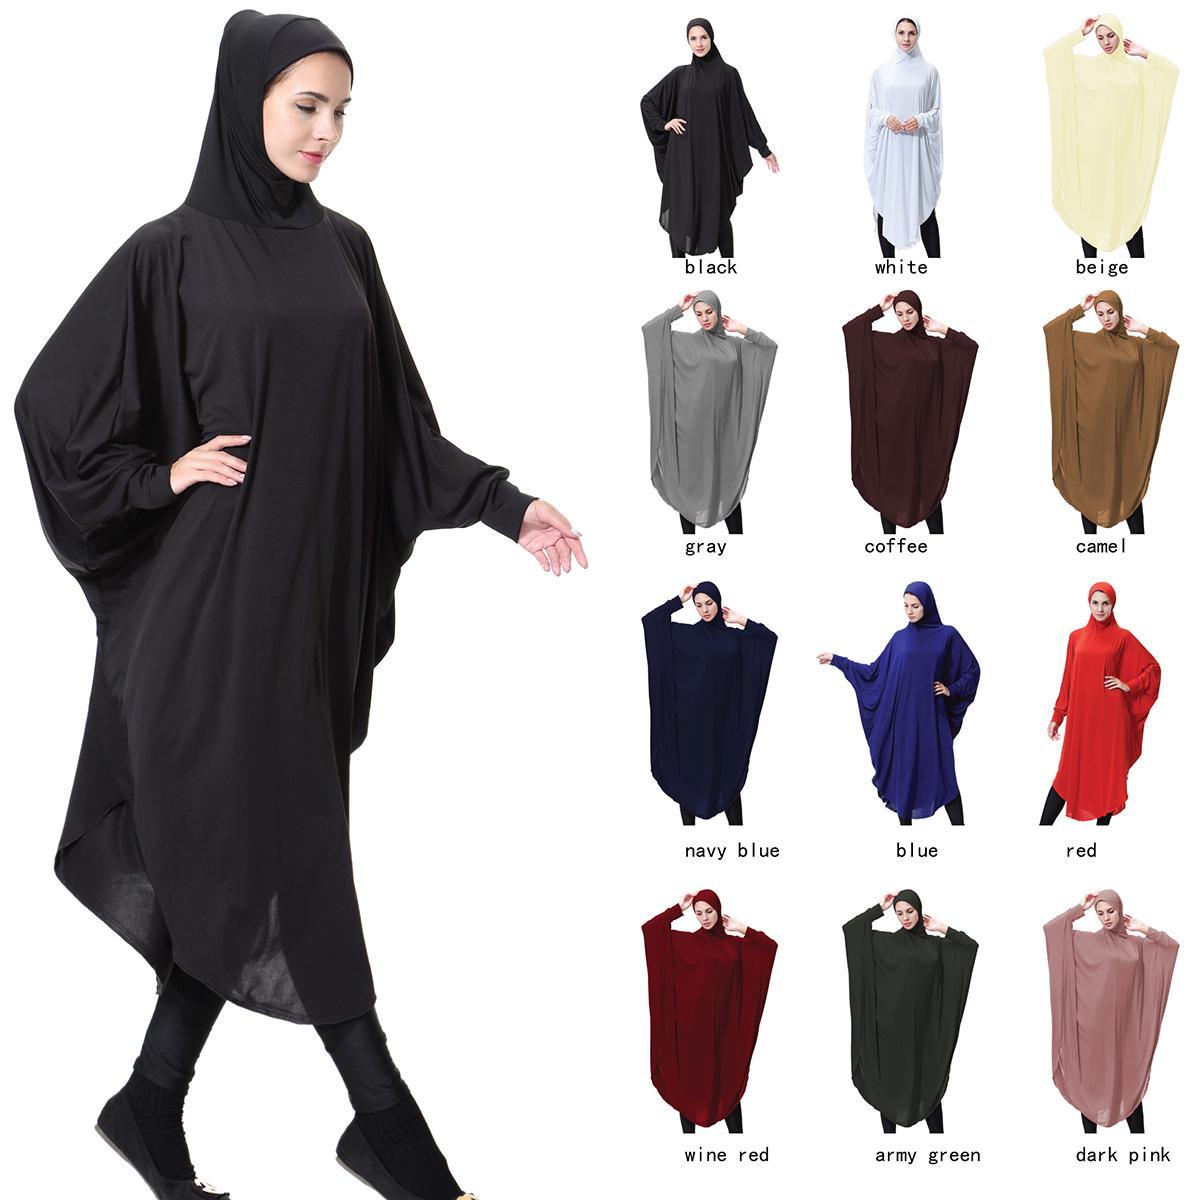 Muslim Black Face Cover Long Hijab Niqab Burqa Bonnet Islamic Khimar Loop Scarf Jilbab Prayer Clothing Headscarf Abaya Ramadan